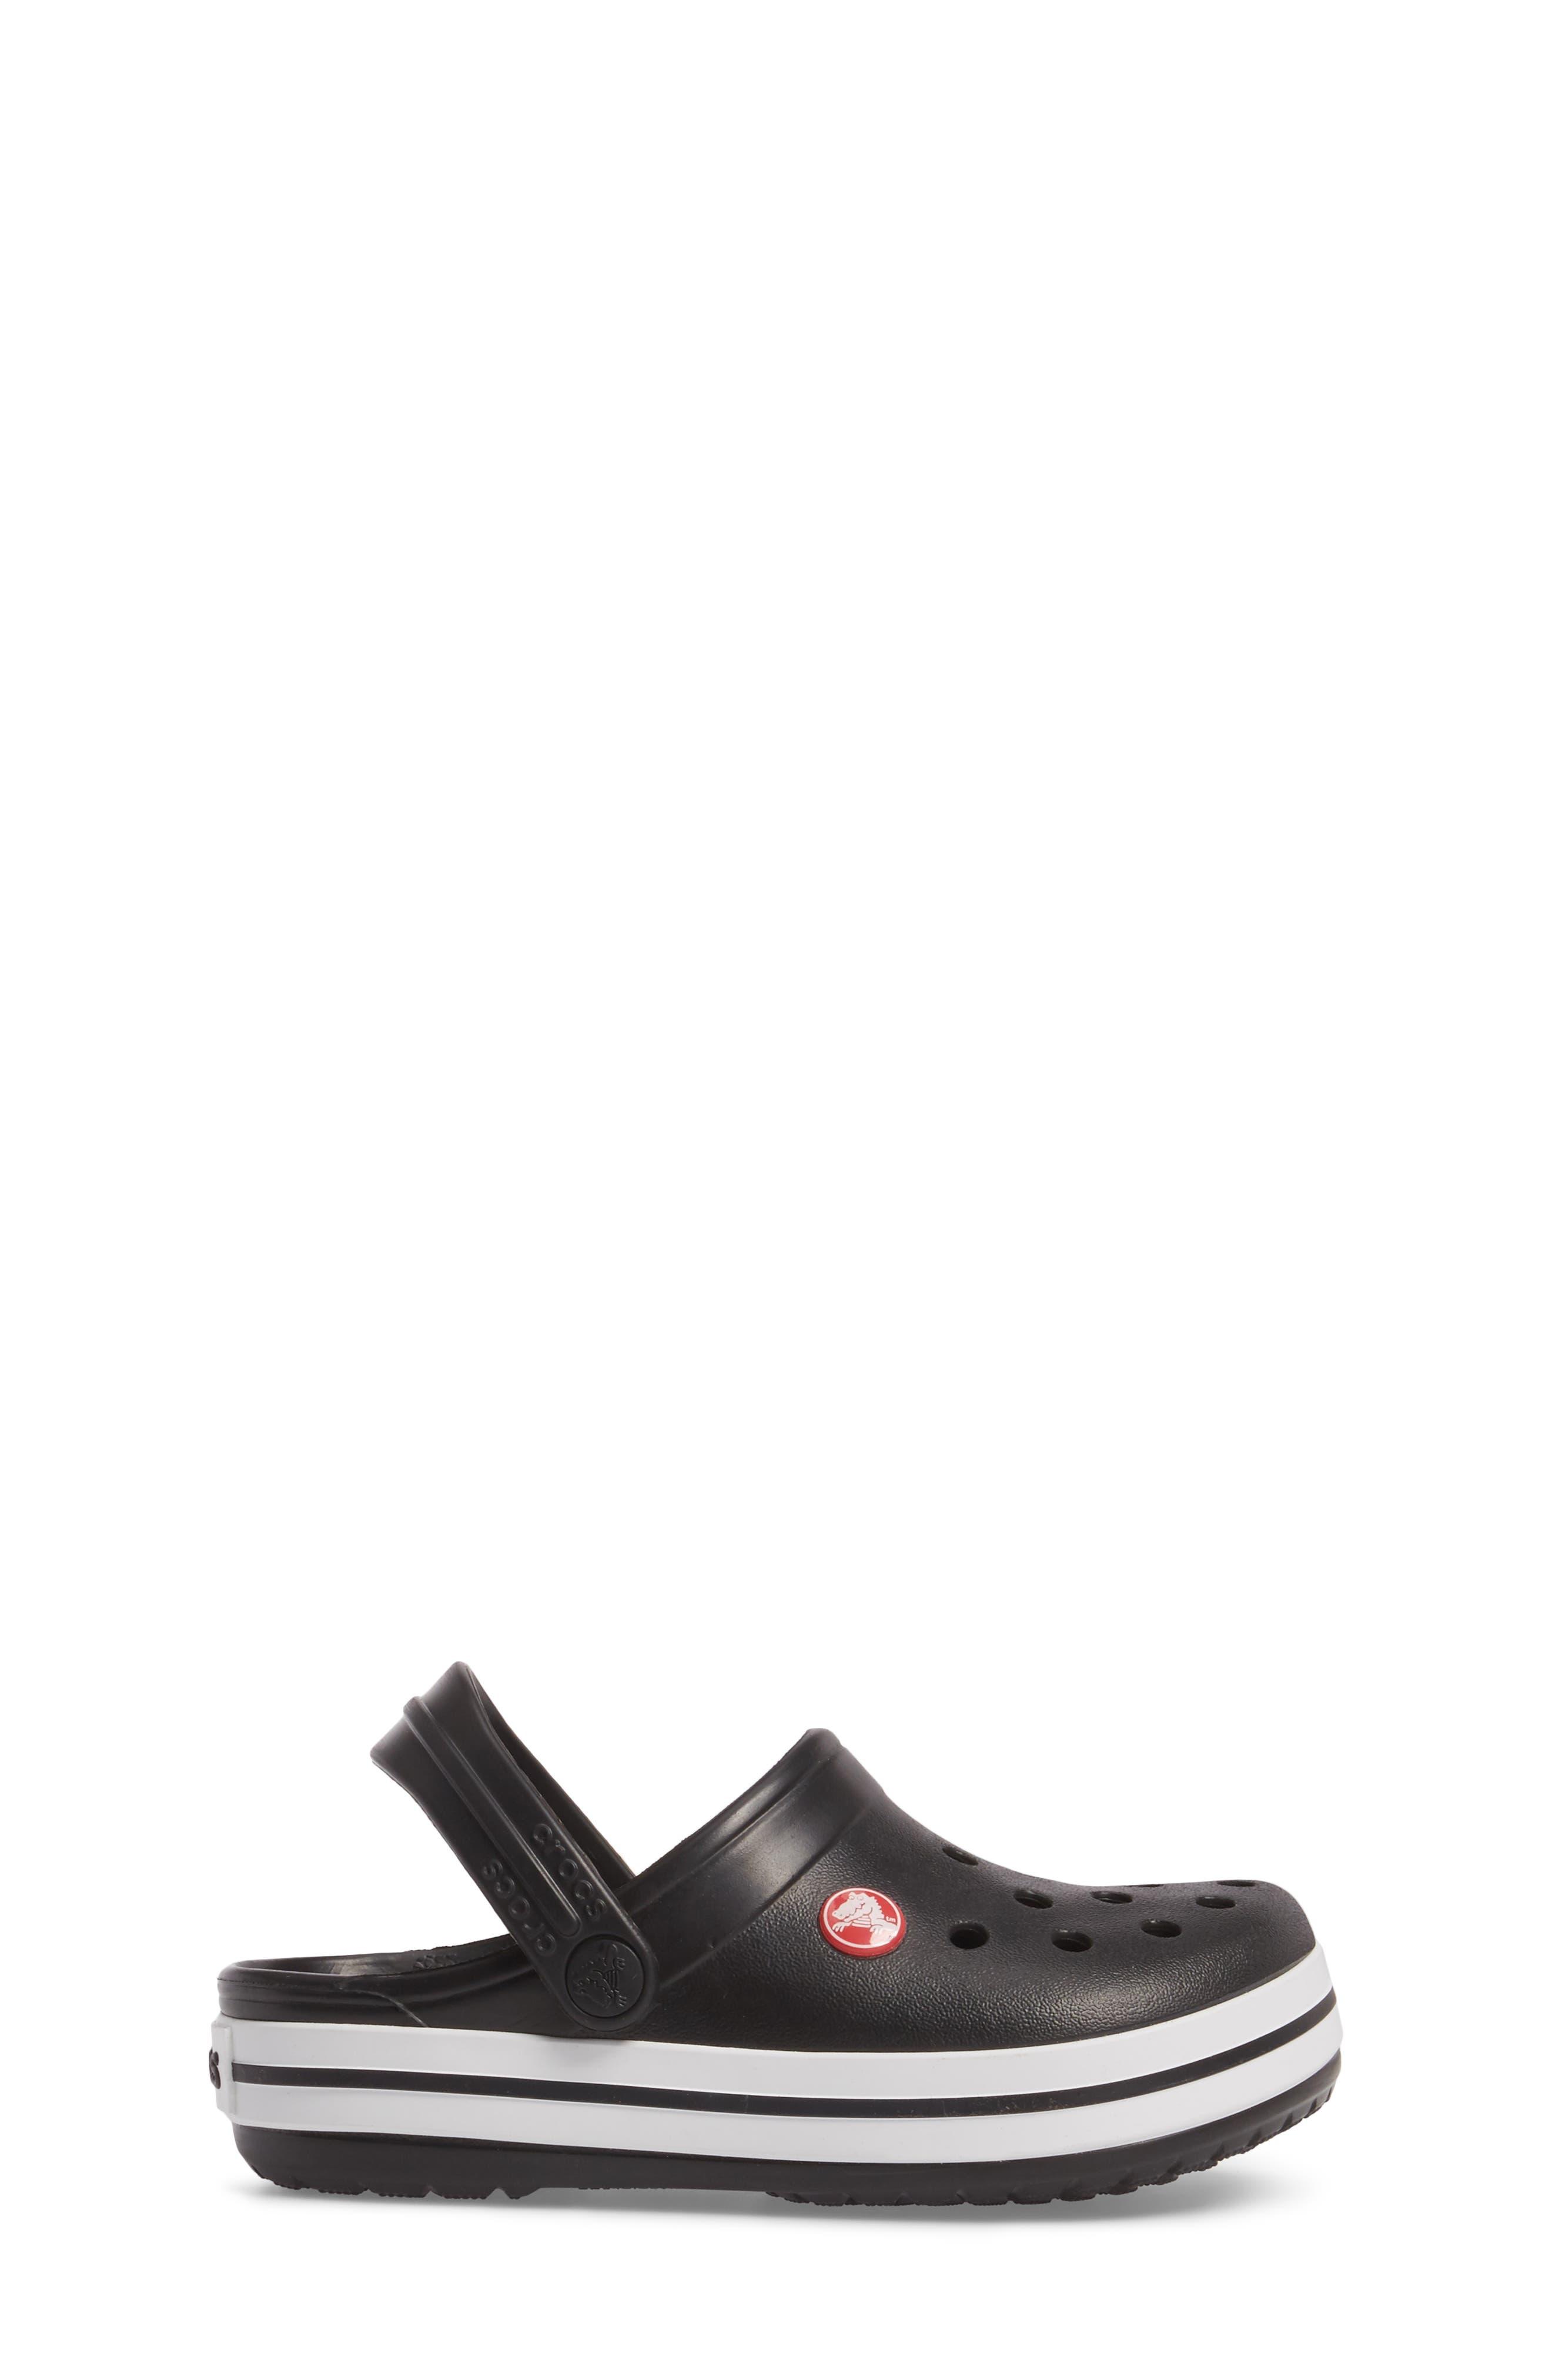 Crocband Clog,                             Alternate thumbnail 3, color,                             BLACK